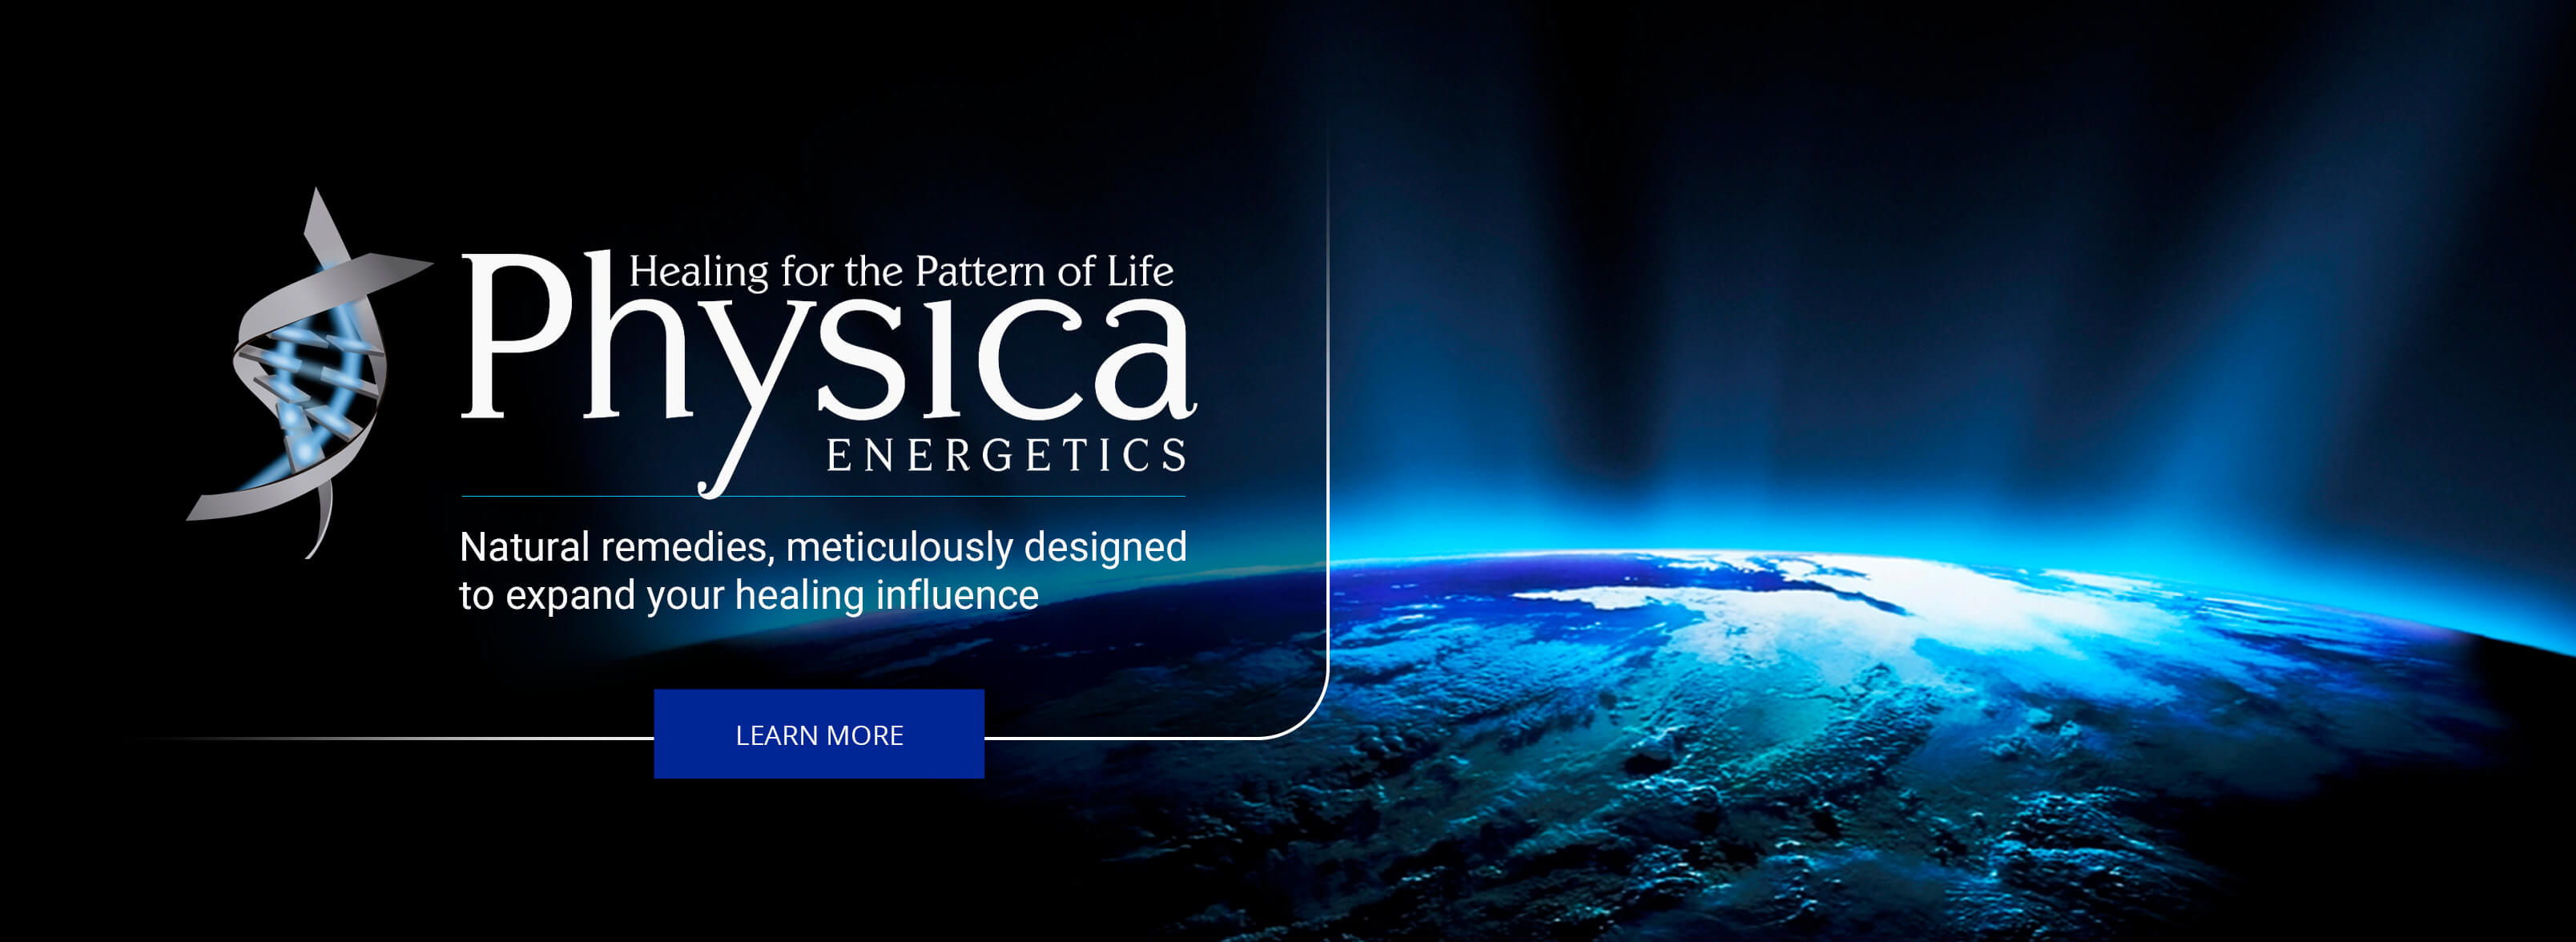 Physica Energetics Original Homepage Banner